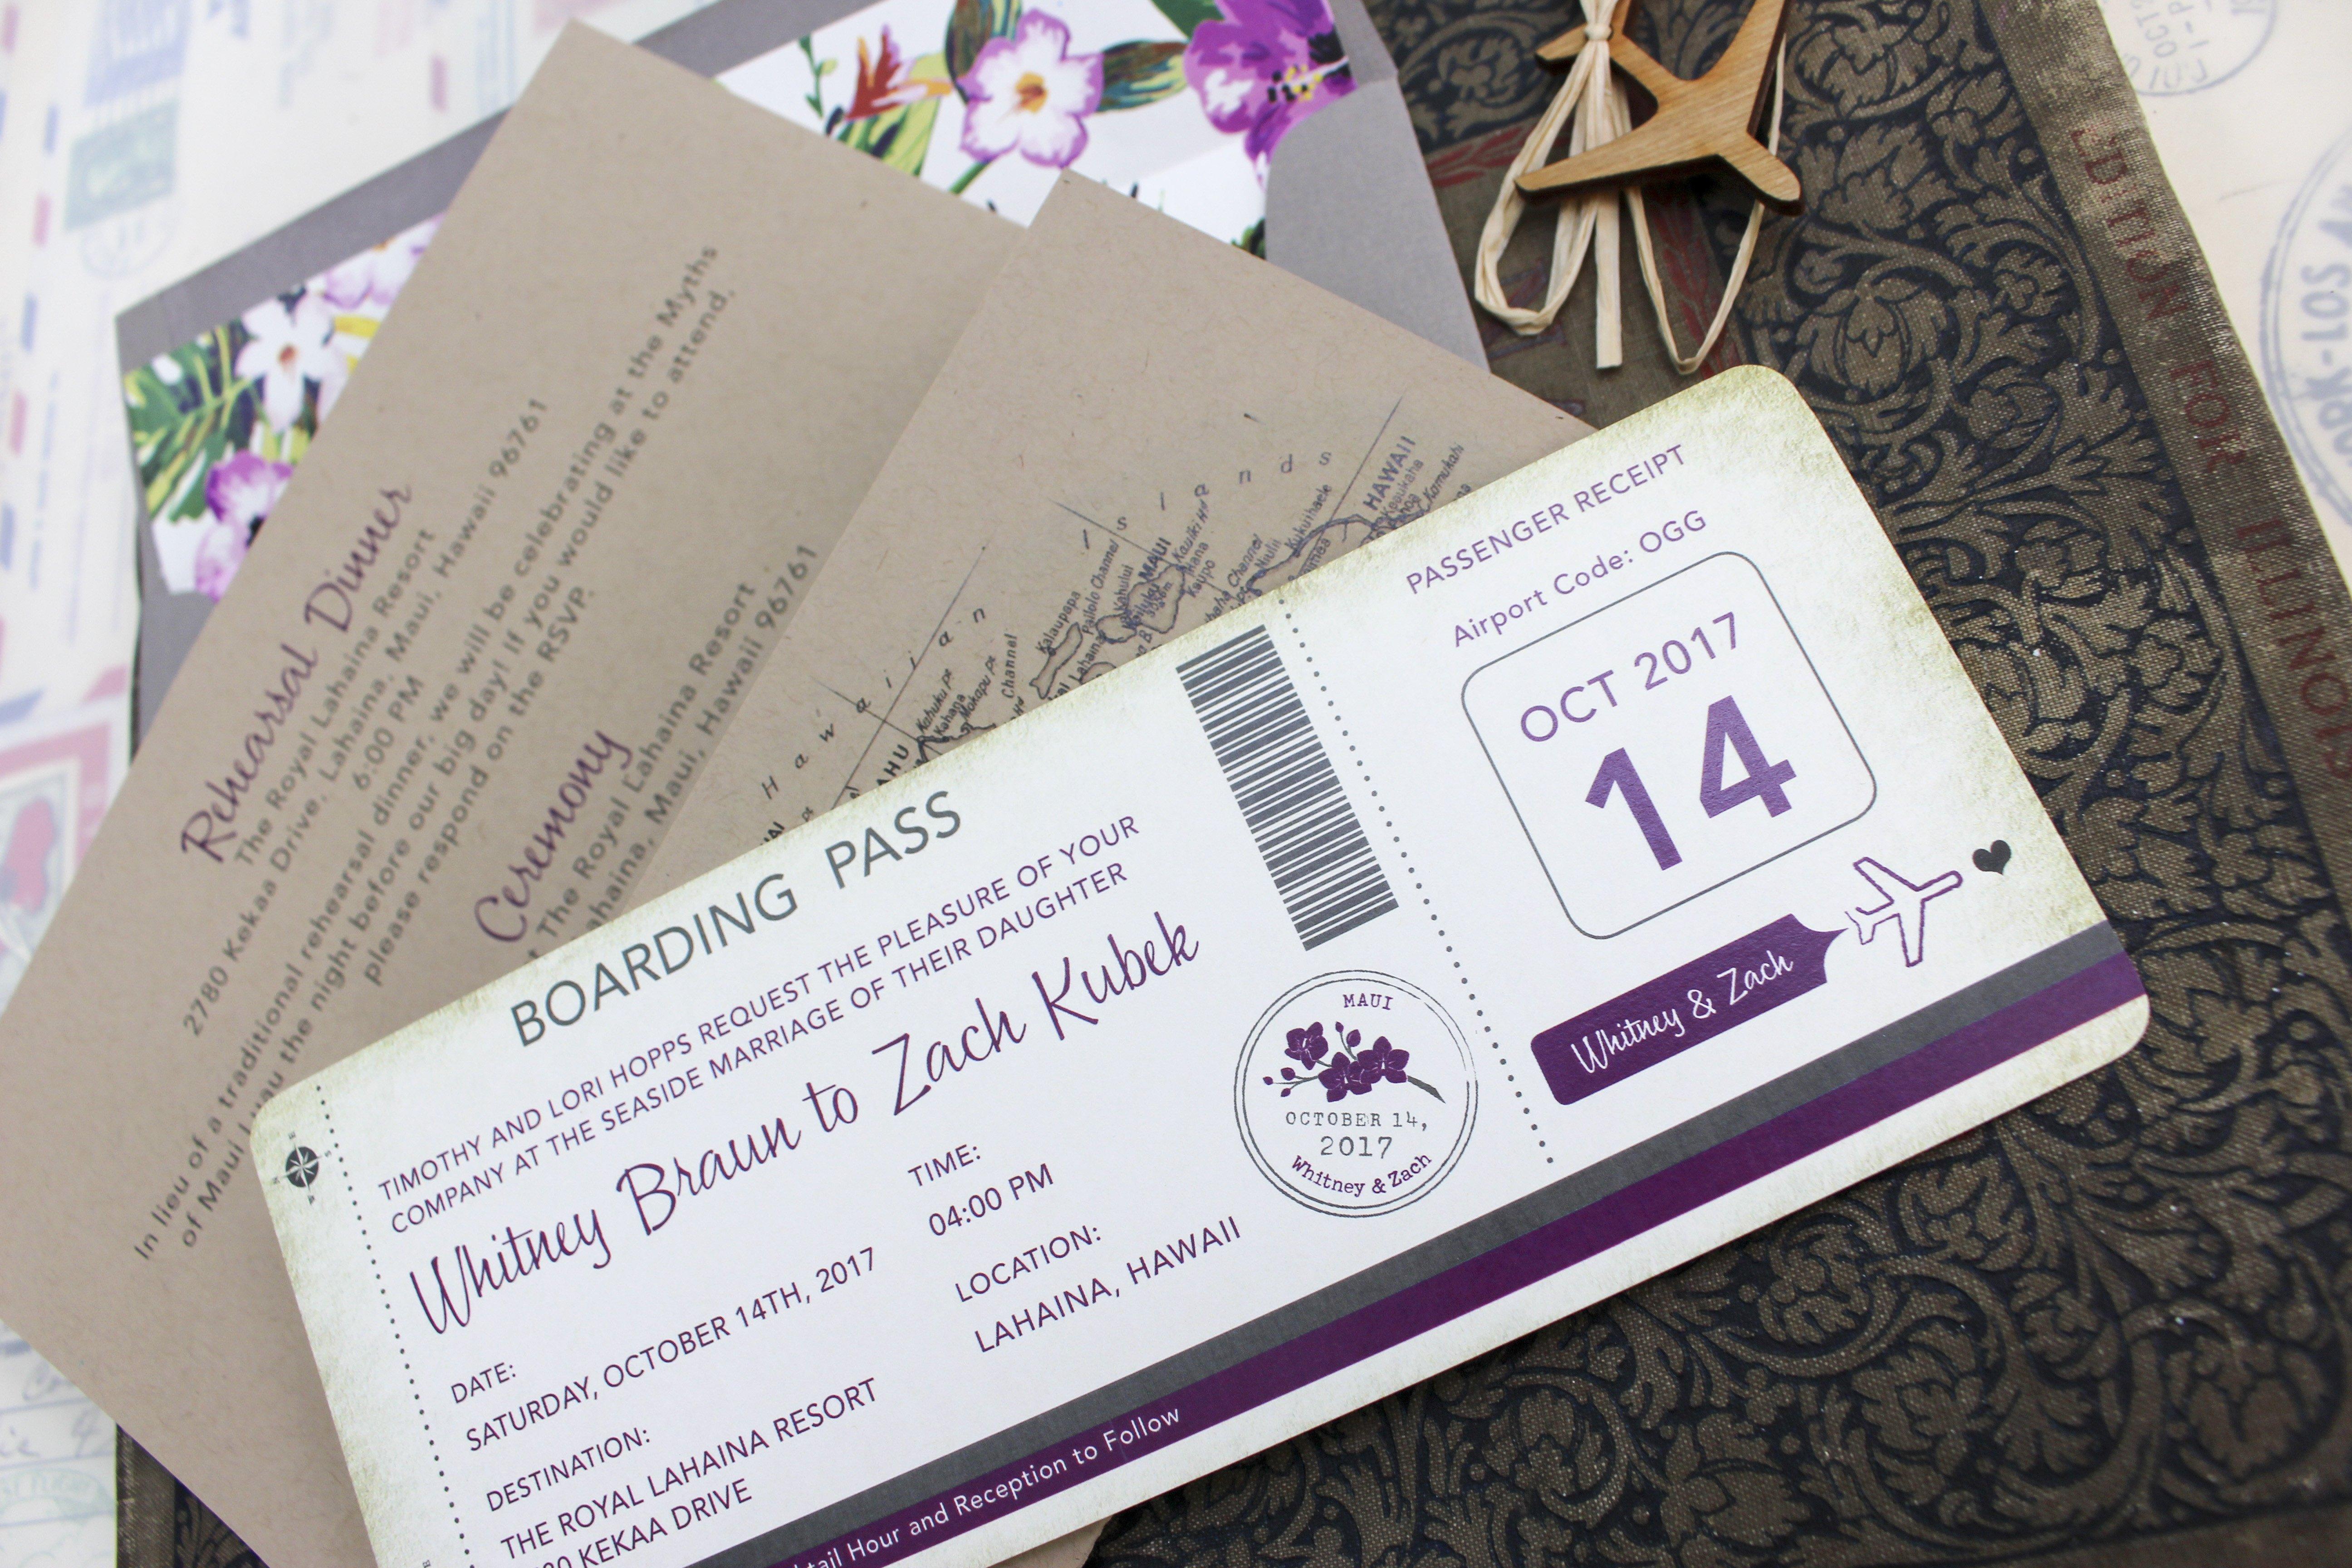 Boarding Pass Wedding Invitations Vintage Floral Boarding Pass Wedding Invitation Maui Hawaii